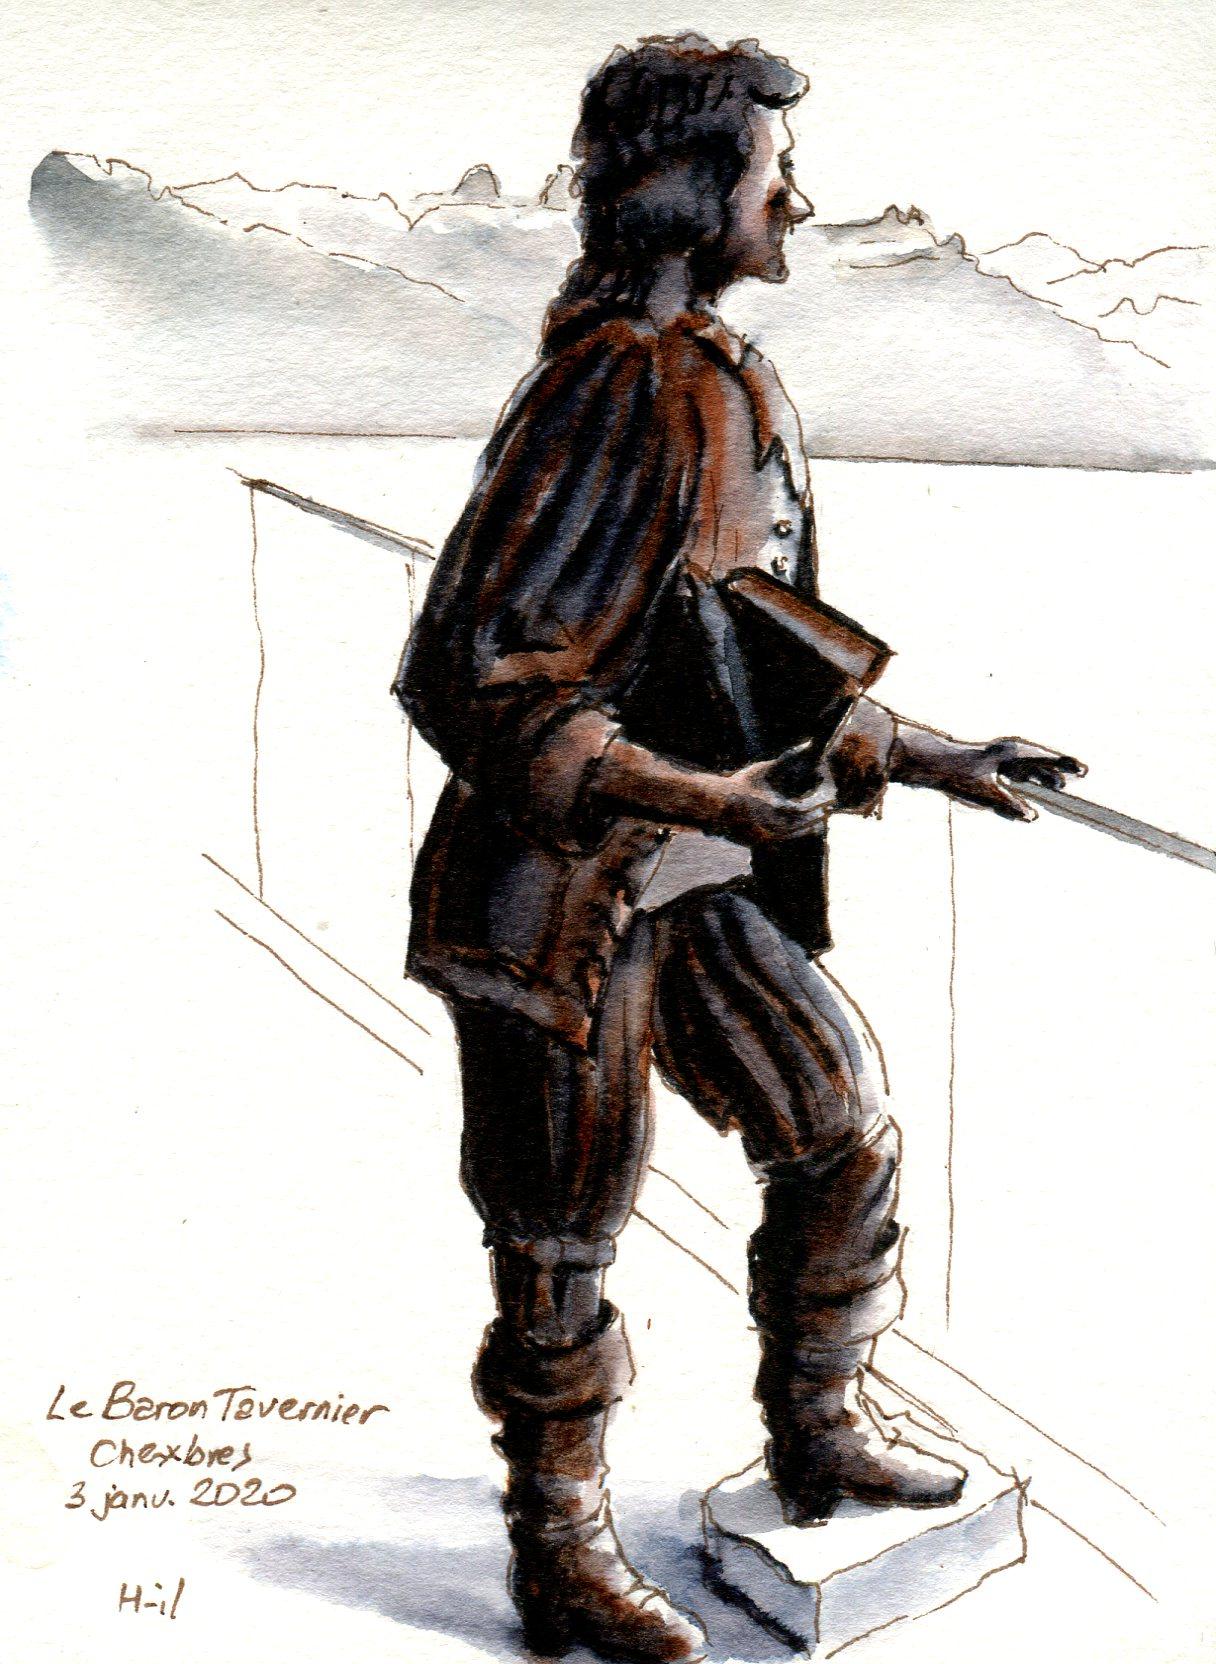 Baron Tavernier059